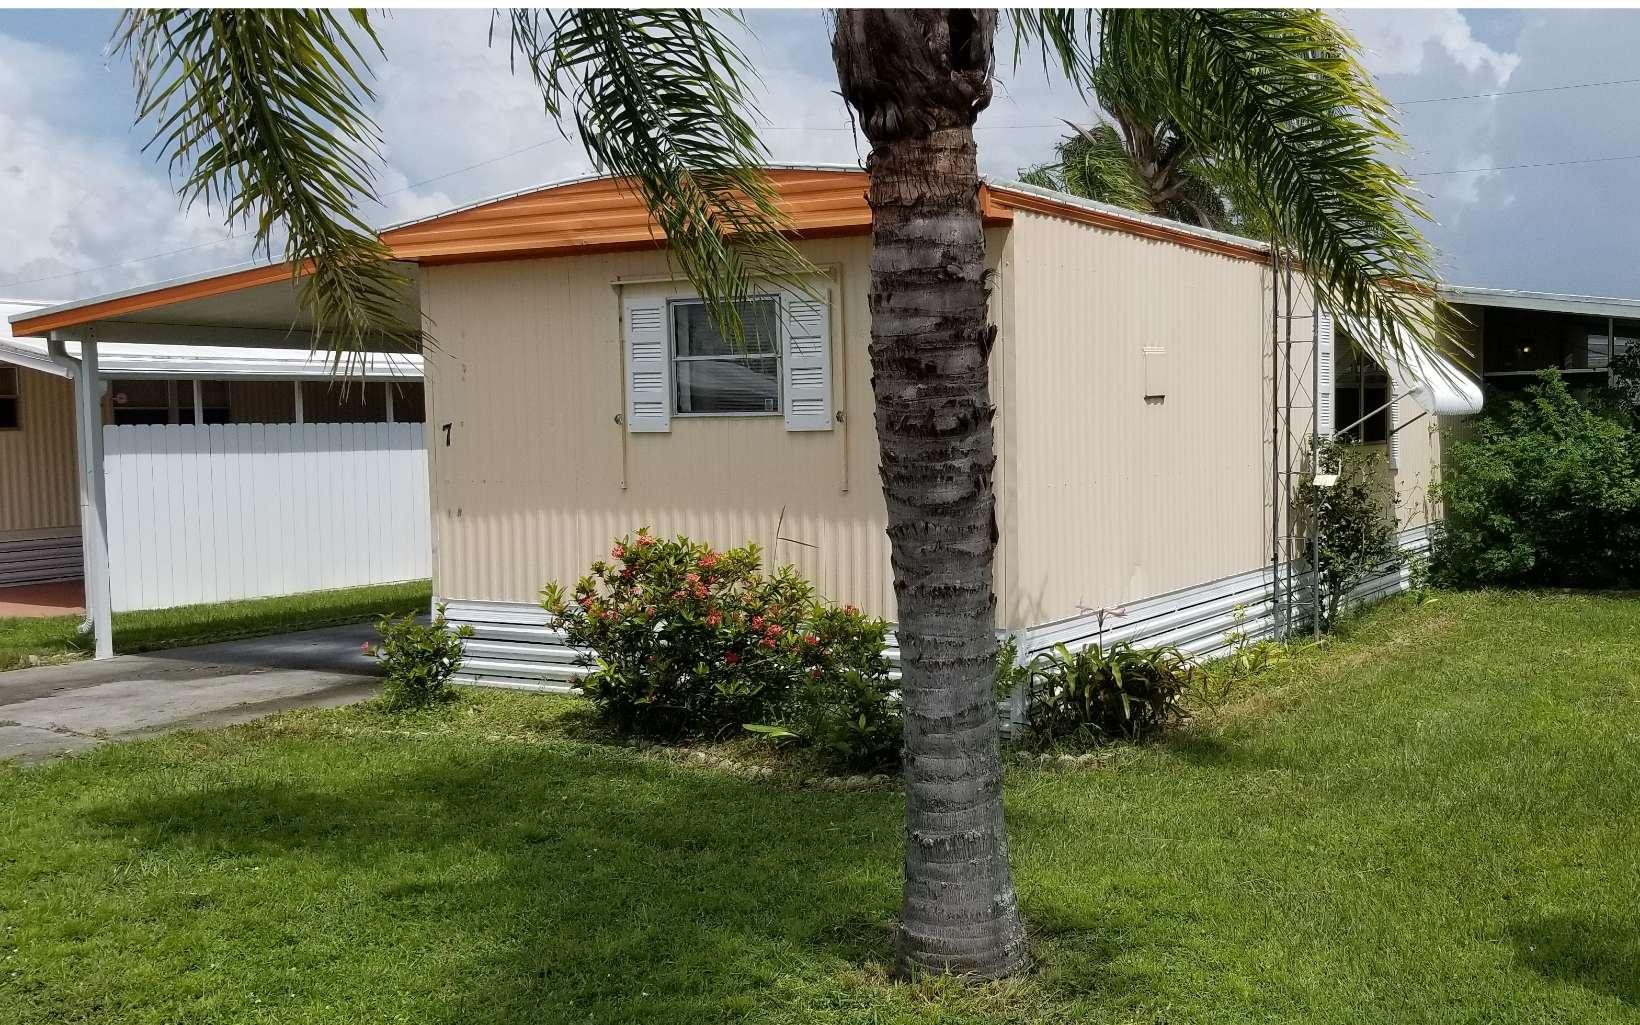 7 Bryan St, Lake Placid, FL 33852